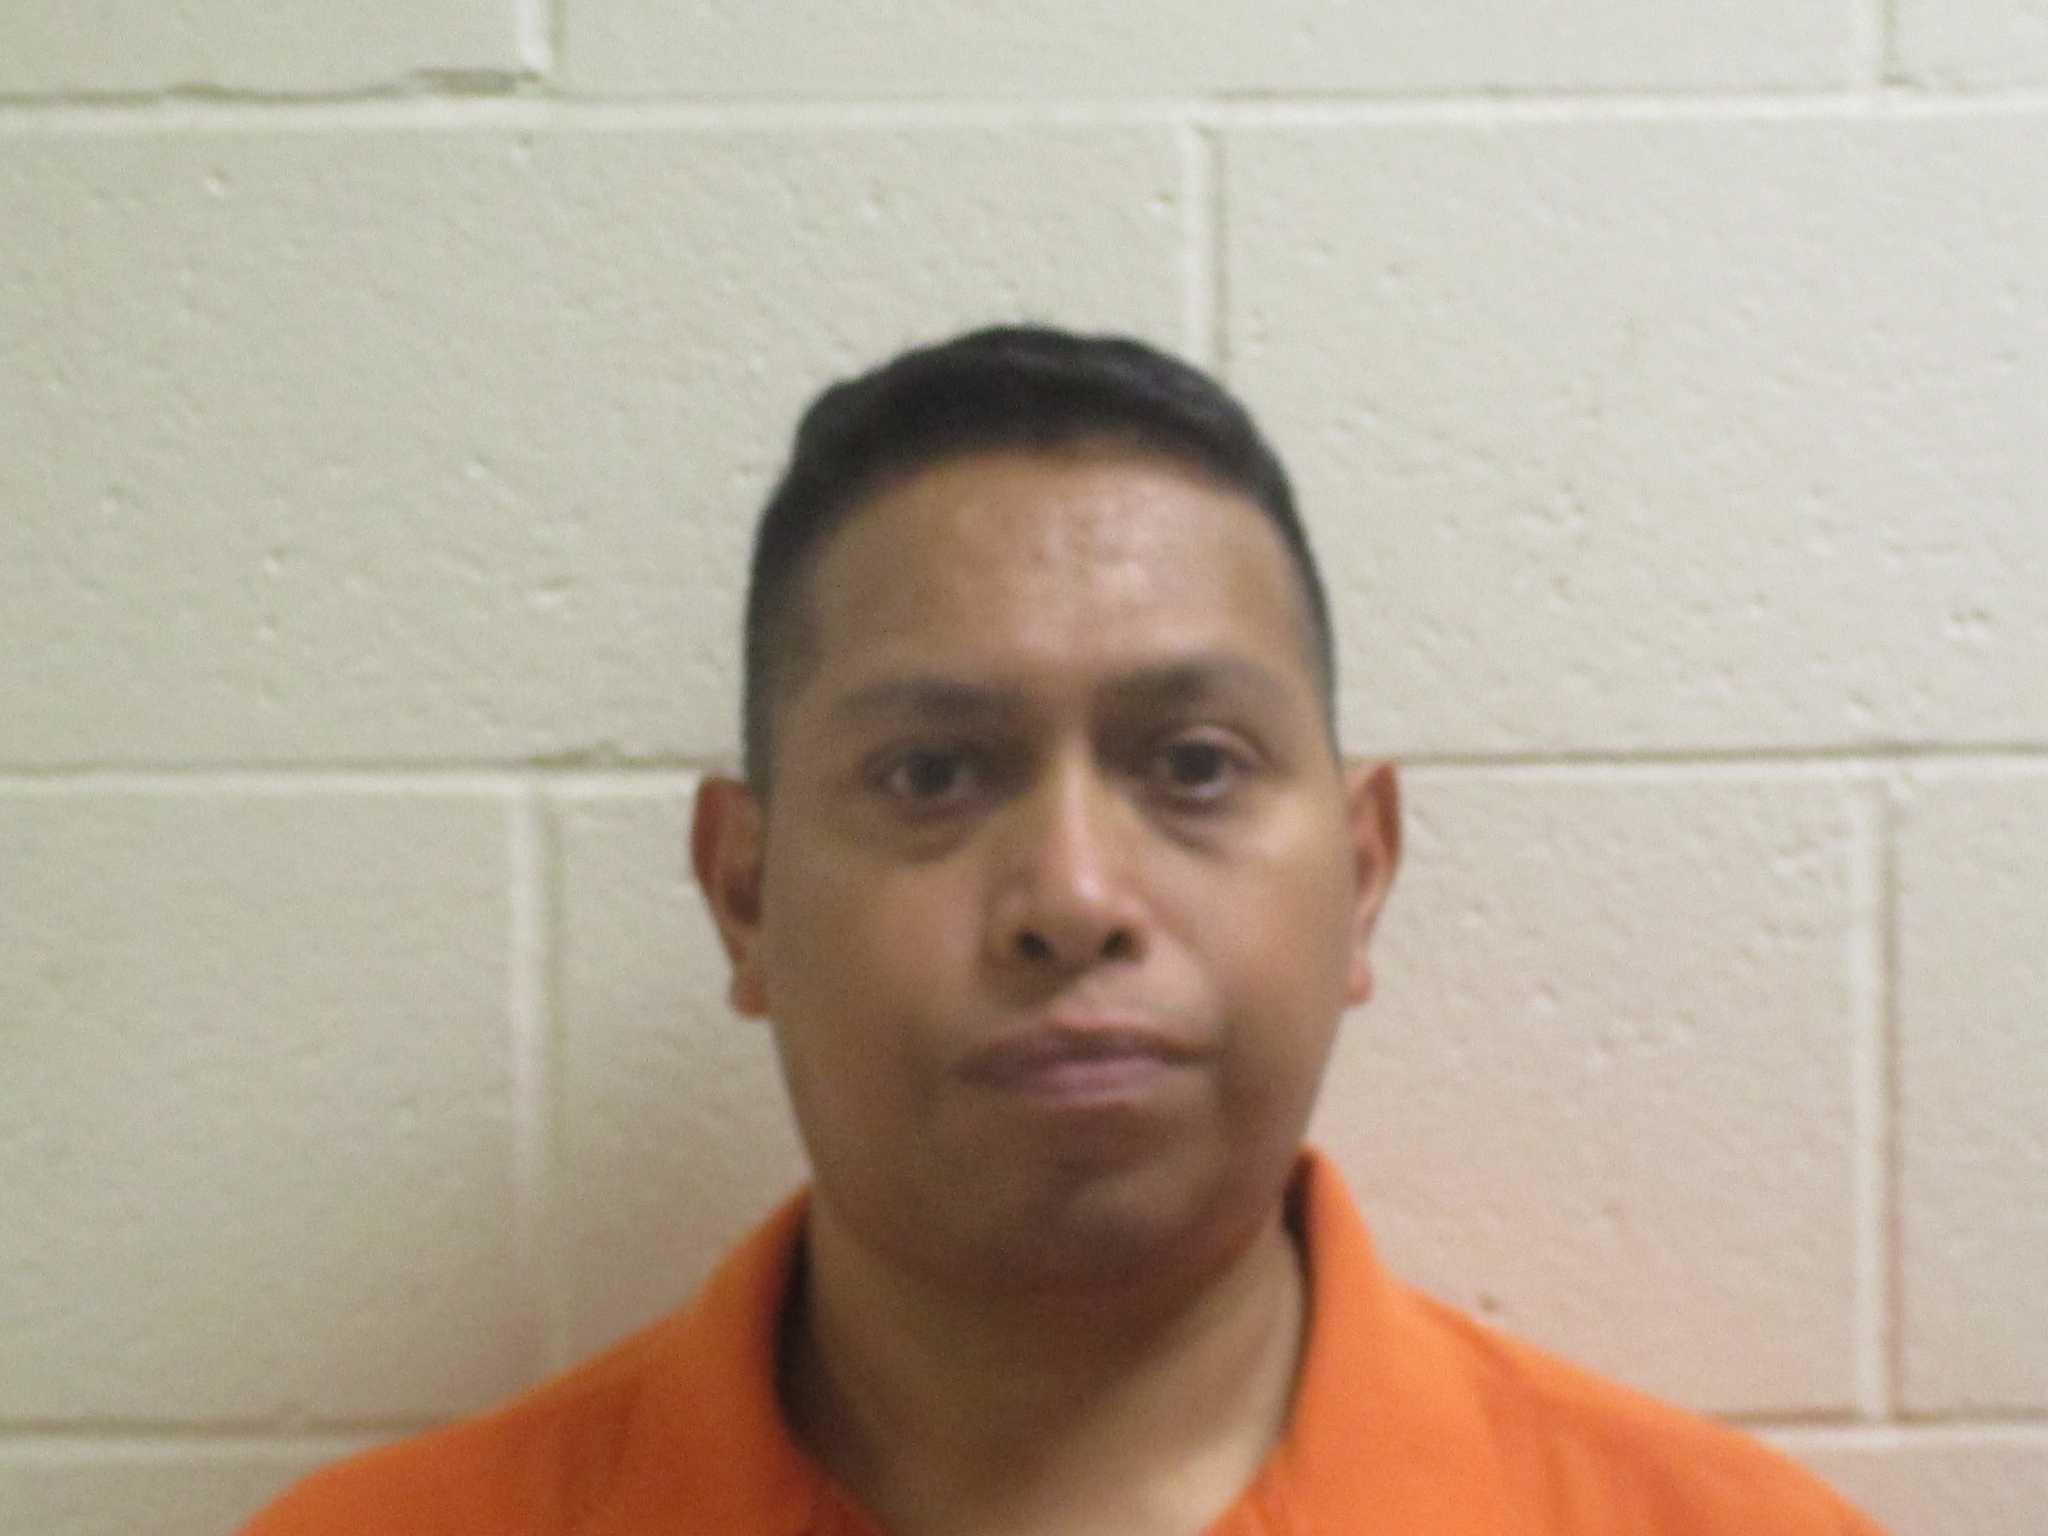 San antonio teacher caught dating student